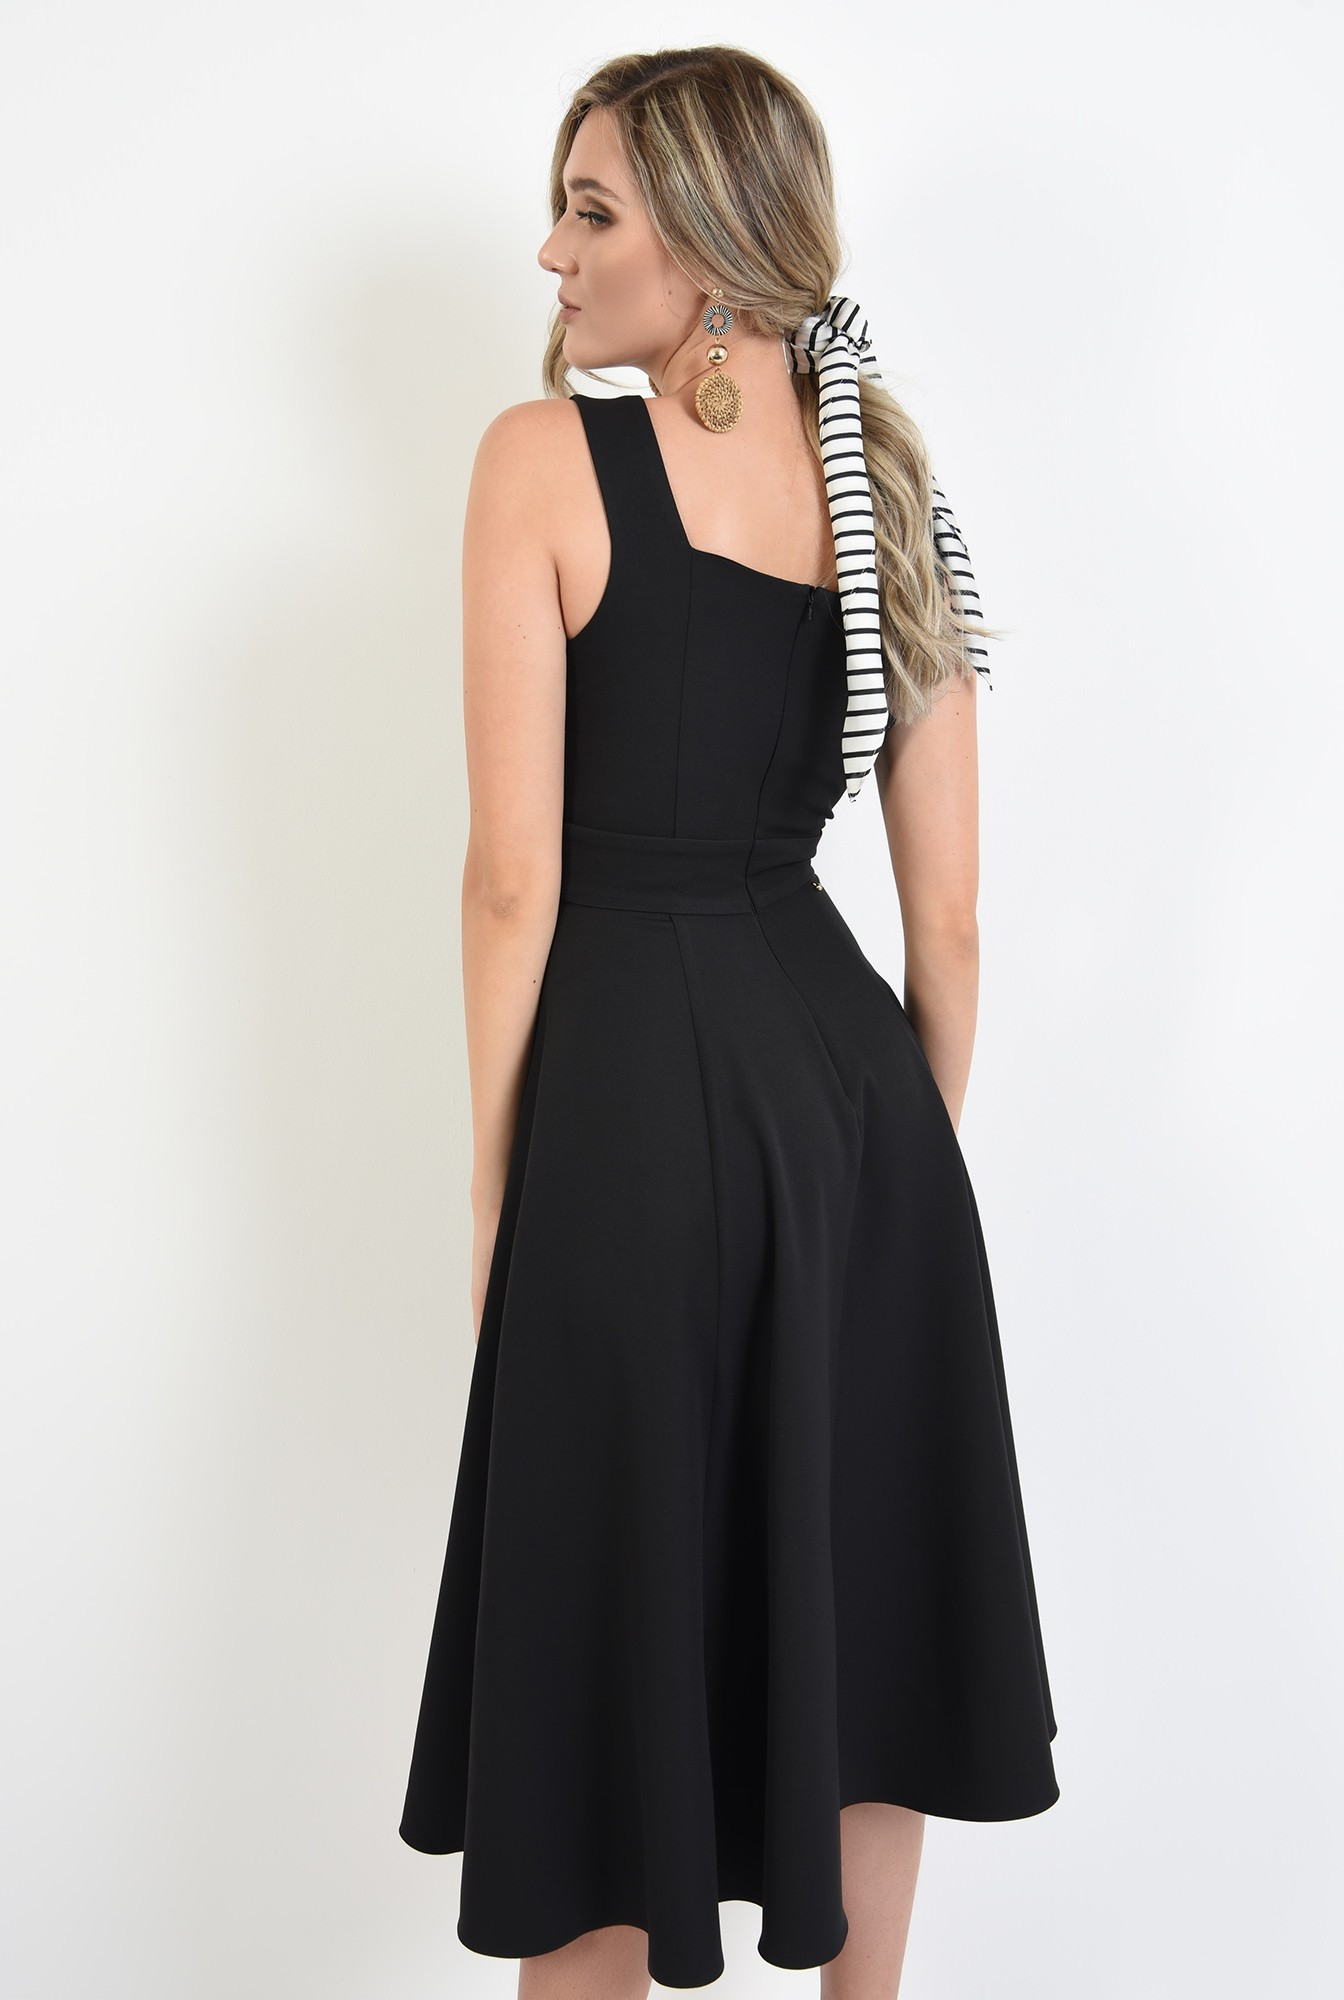 0 - 360 - rochie neagra, cu detaliu la talie, evazata, Poema